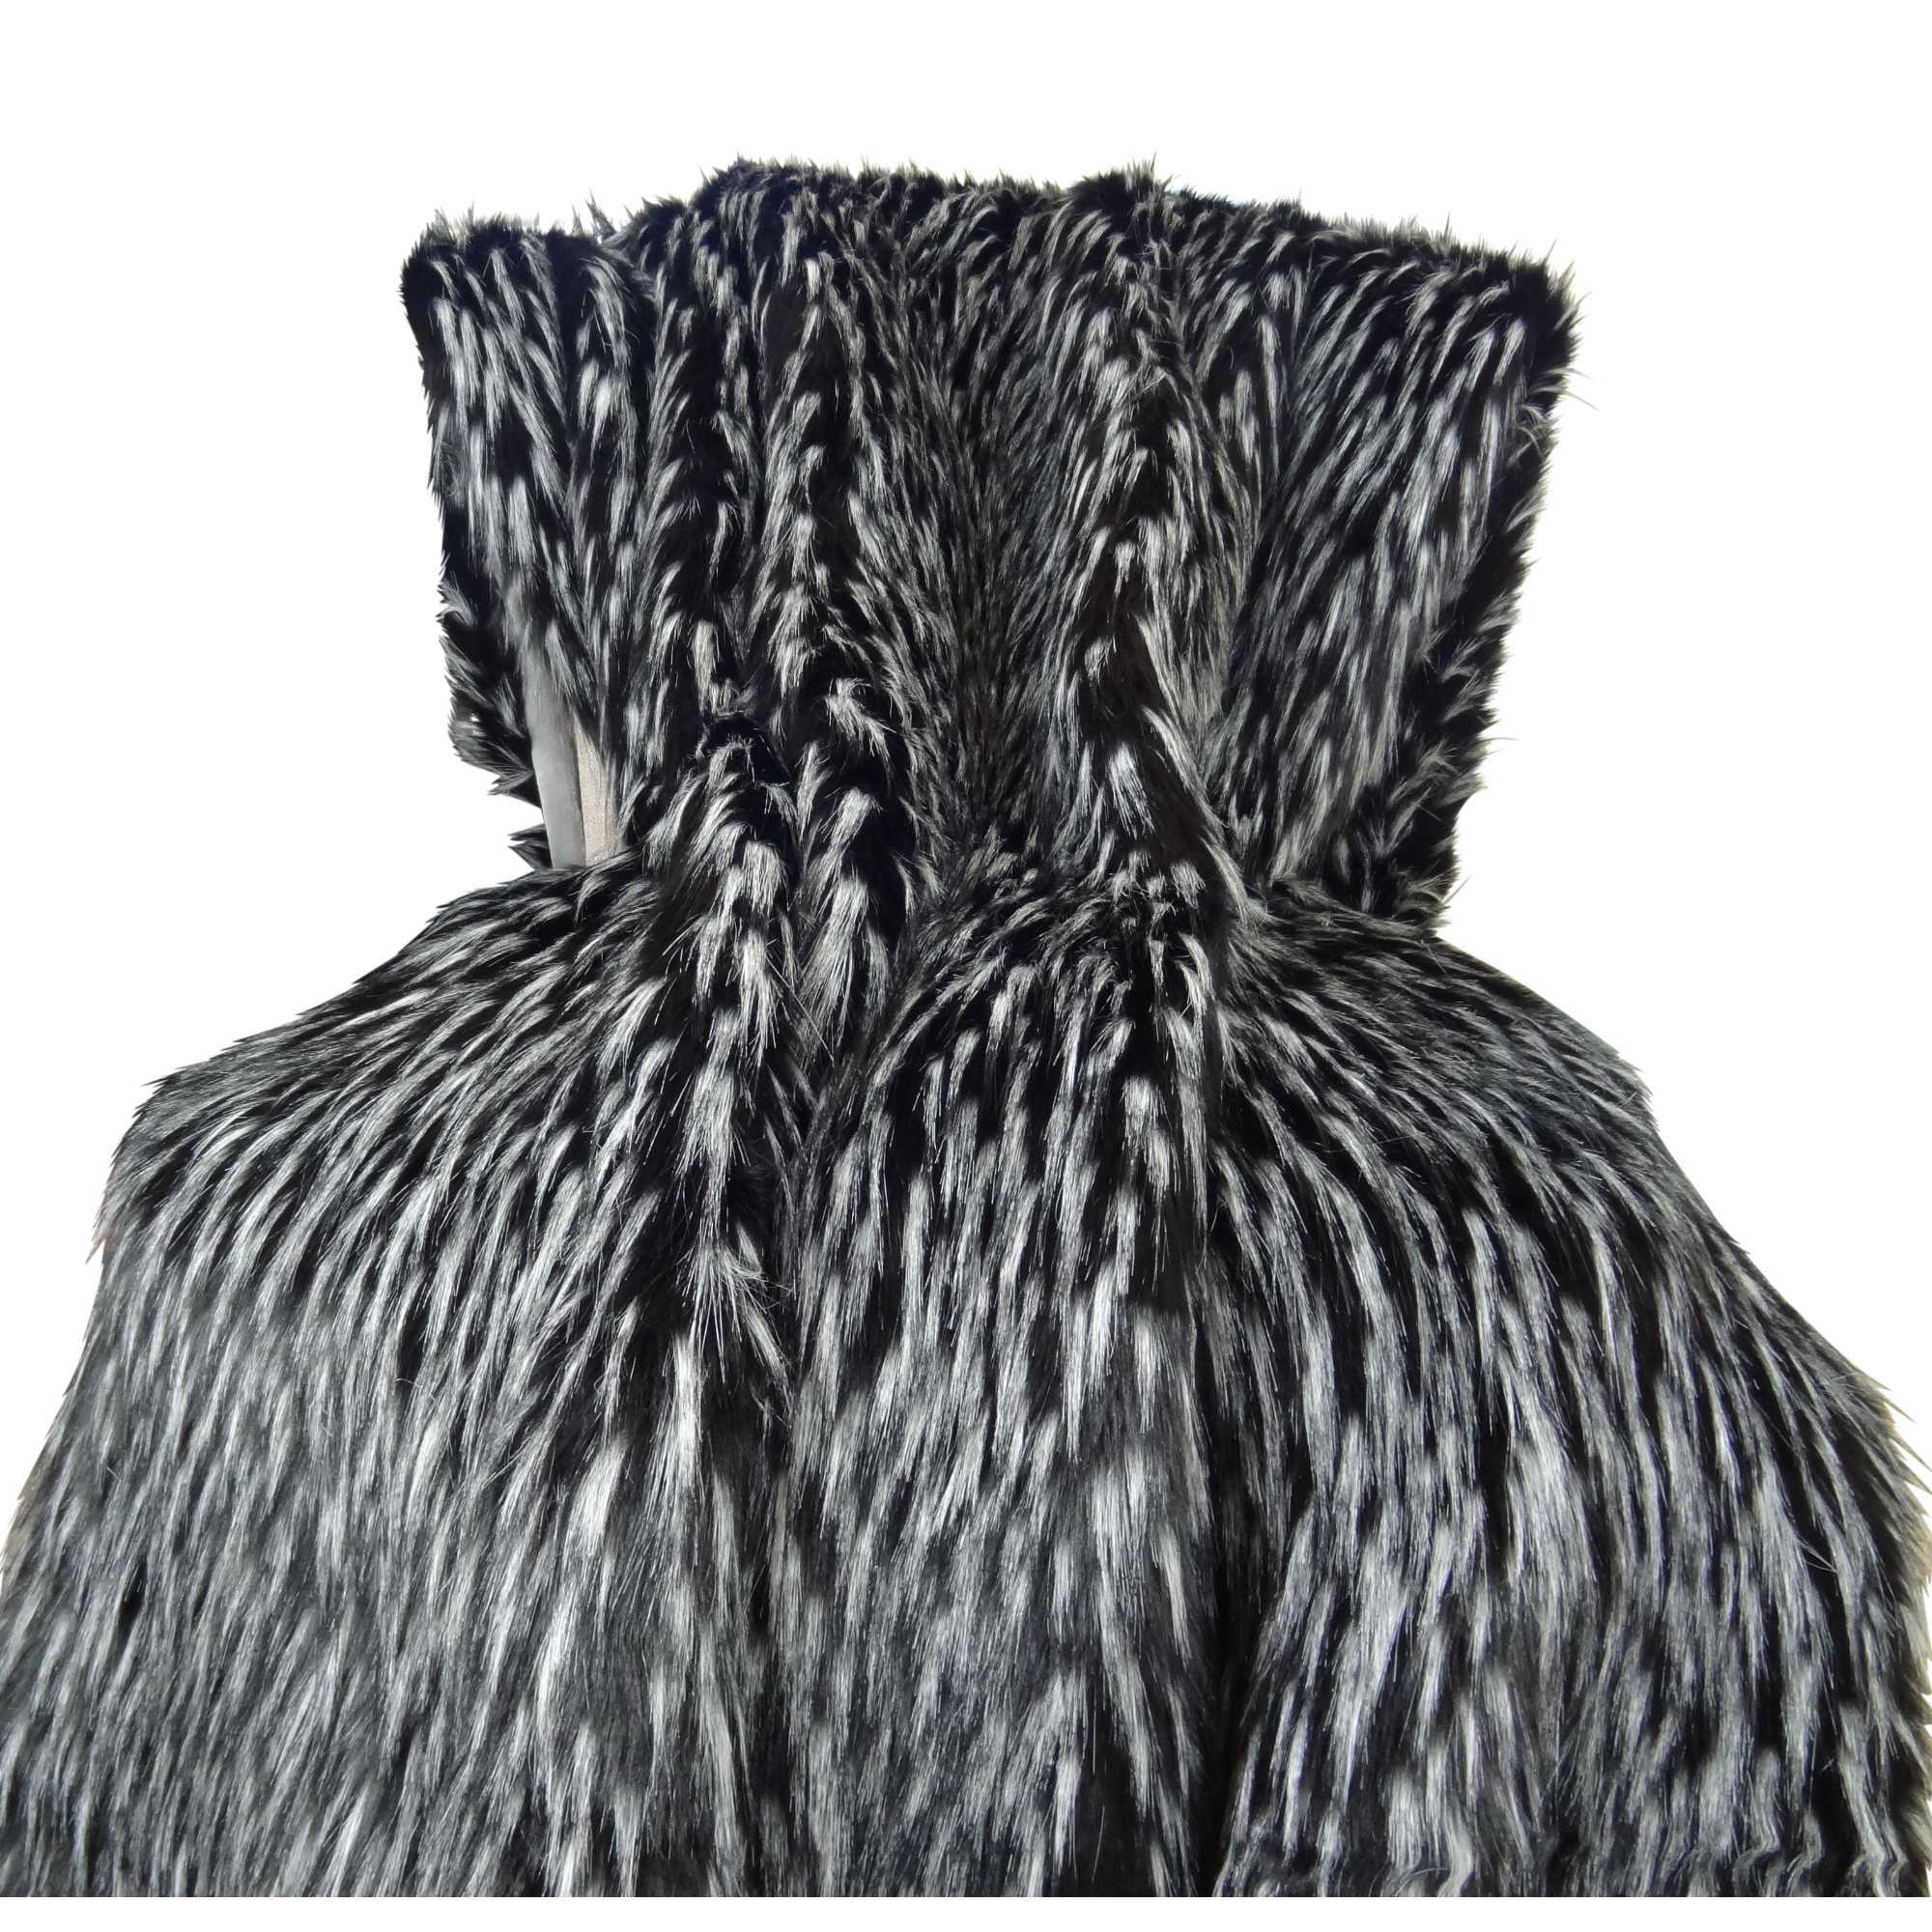 HomeRoots Beddings,Plutus Wolf Fur Handmade Throw,Wolf Fur